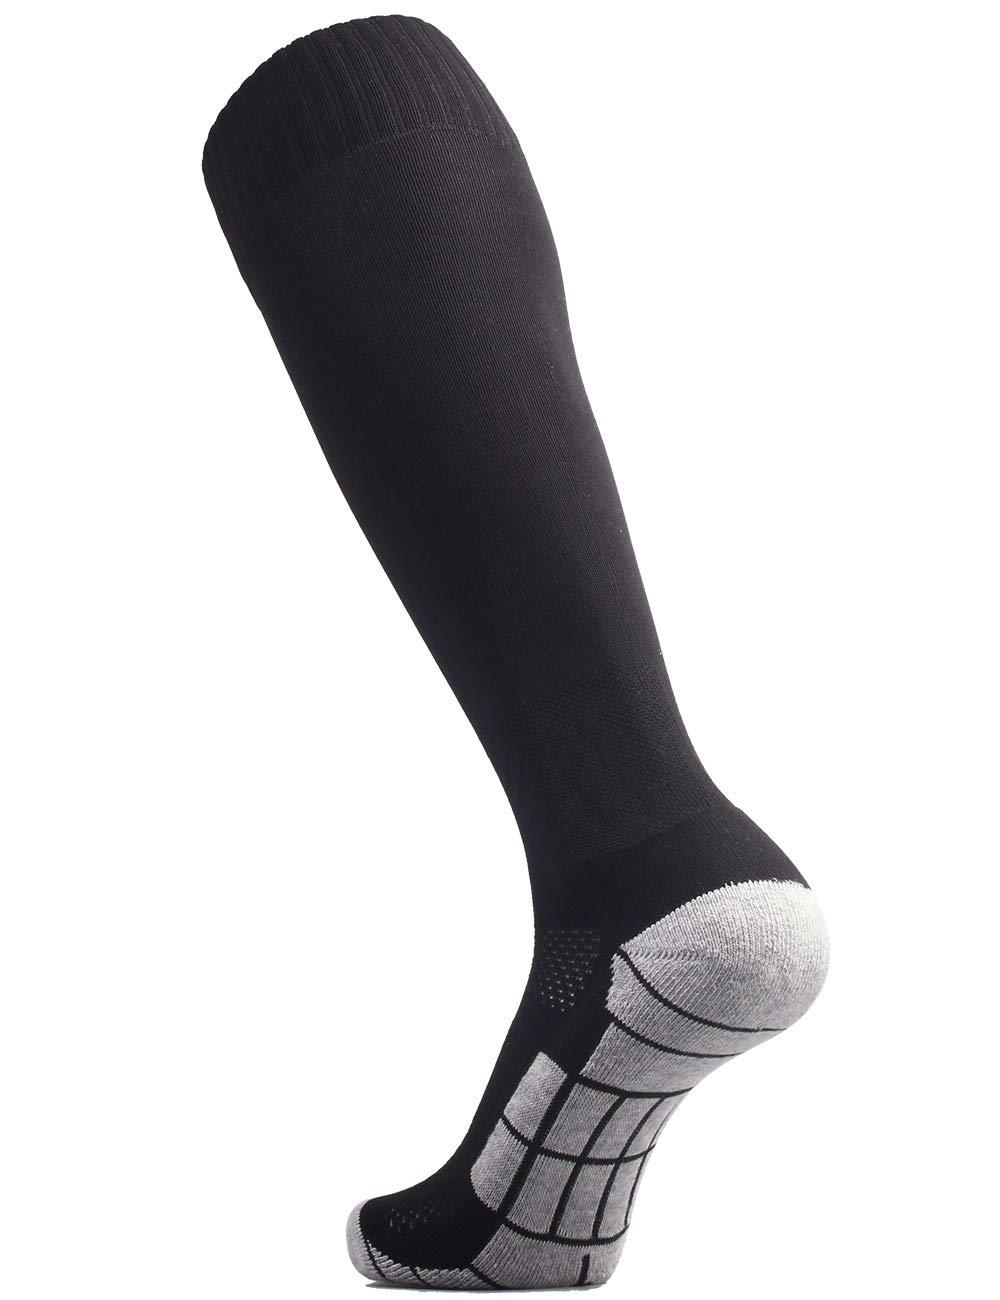 CWVLC Lillte Boy's Soccer Socks Kids Football Sport Team Athletic Knee High Long Tube Cotton Compression Socks Black X-Small (12C-13C Kids/ 1Y-3Y Youth) by CWVLC